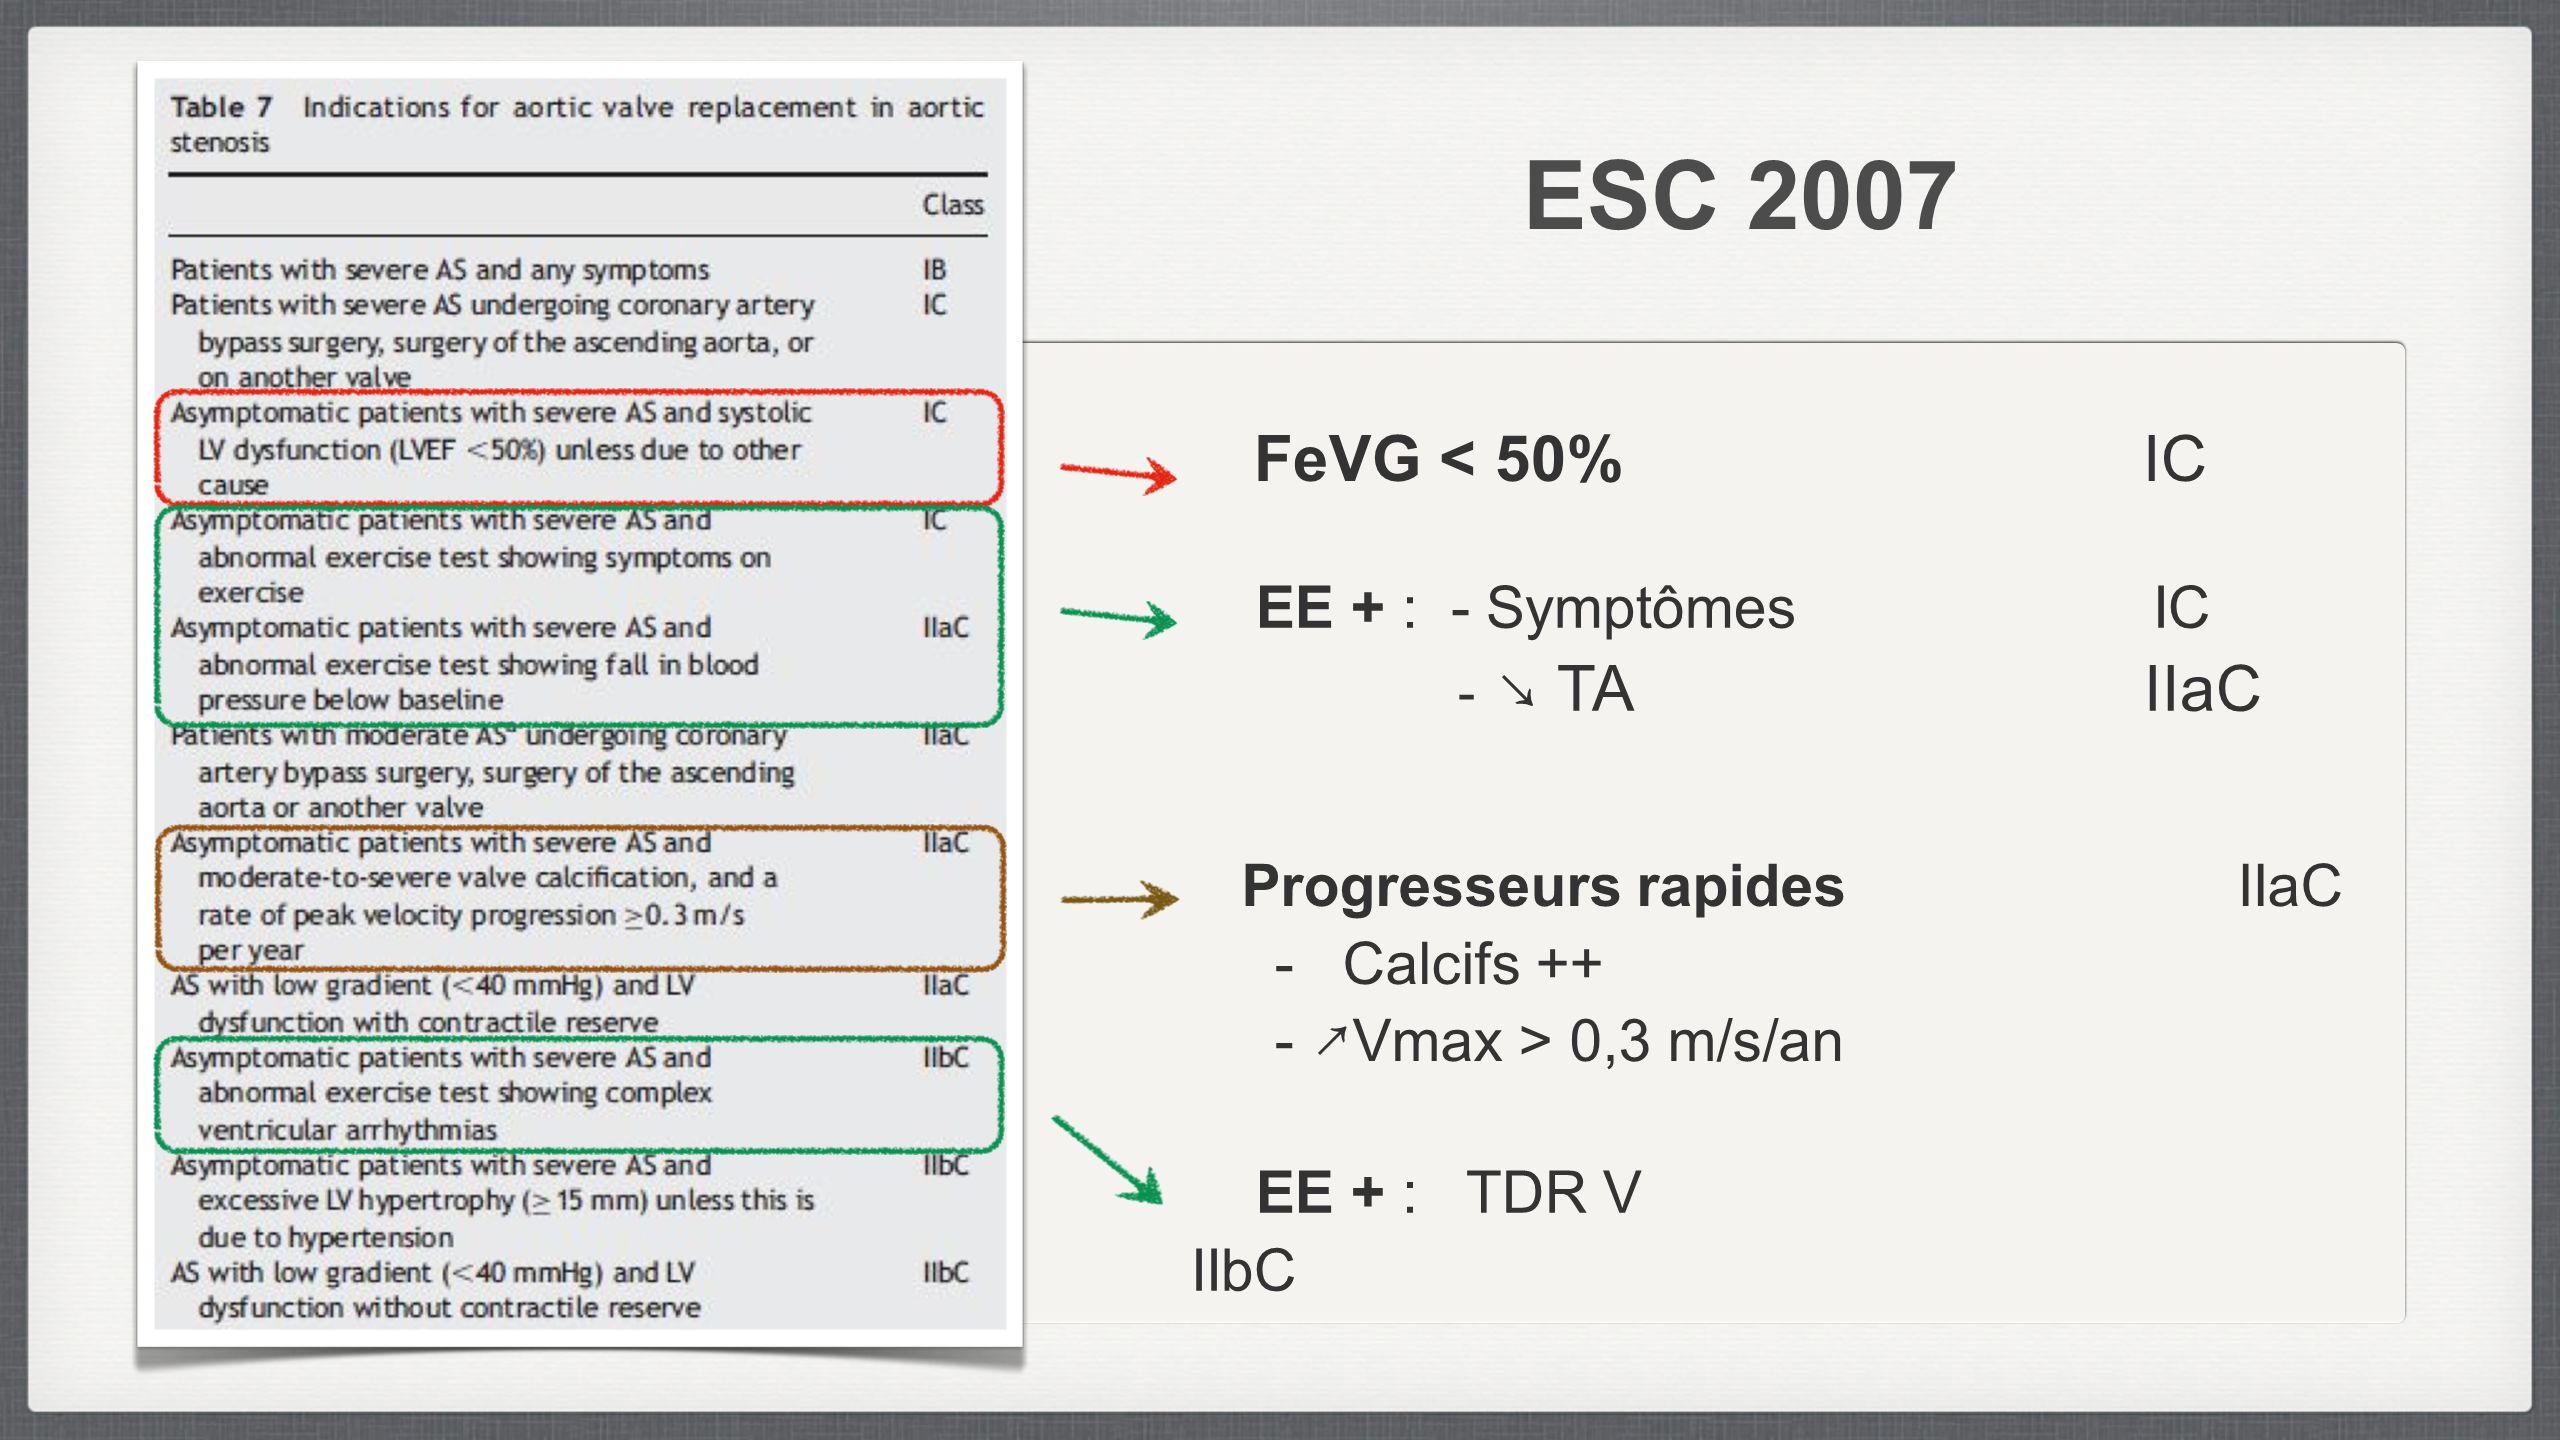 ESC 2007 FeVG < 50% IC - ↘ TA IIaC EE + : - Symptômes IC